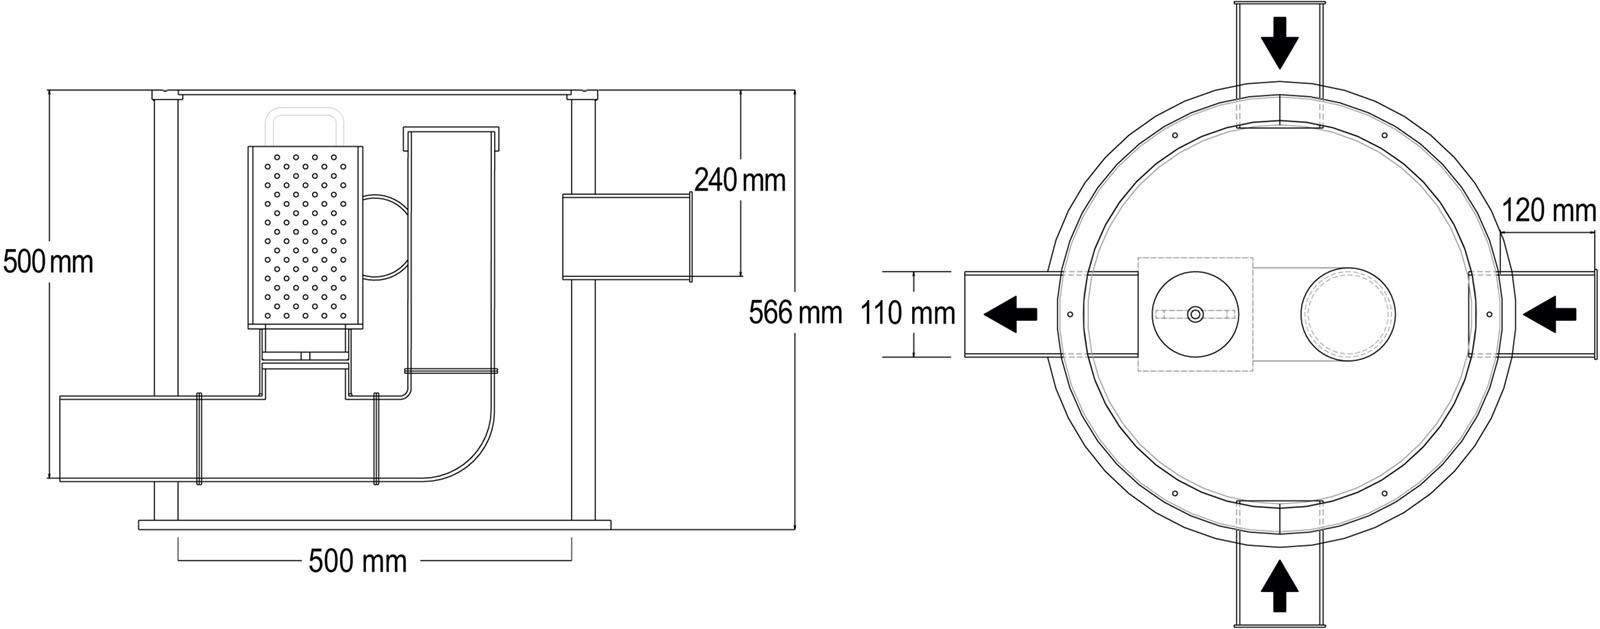 Controflow_SUDS02008_dimensions